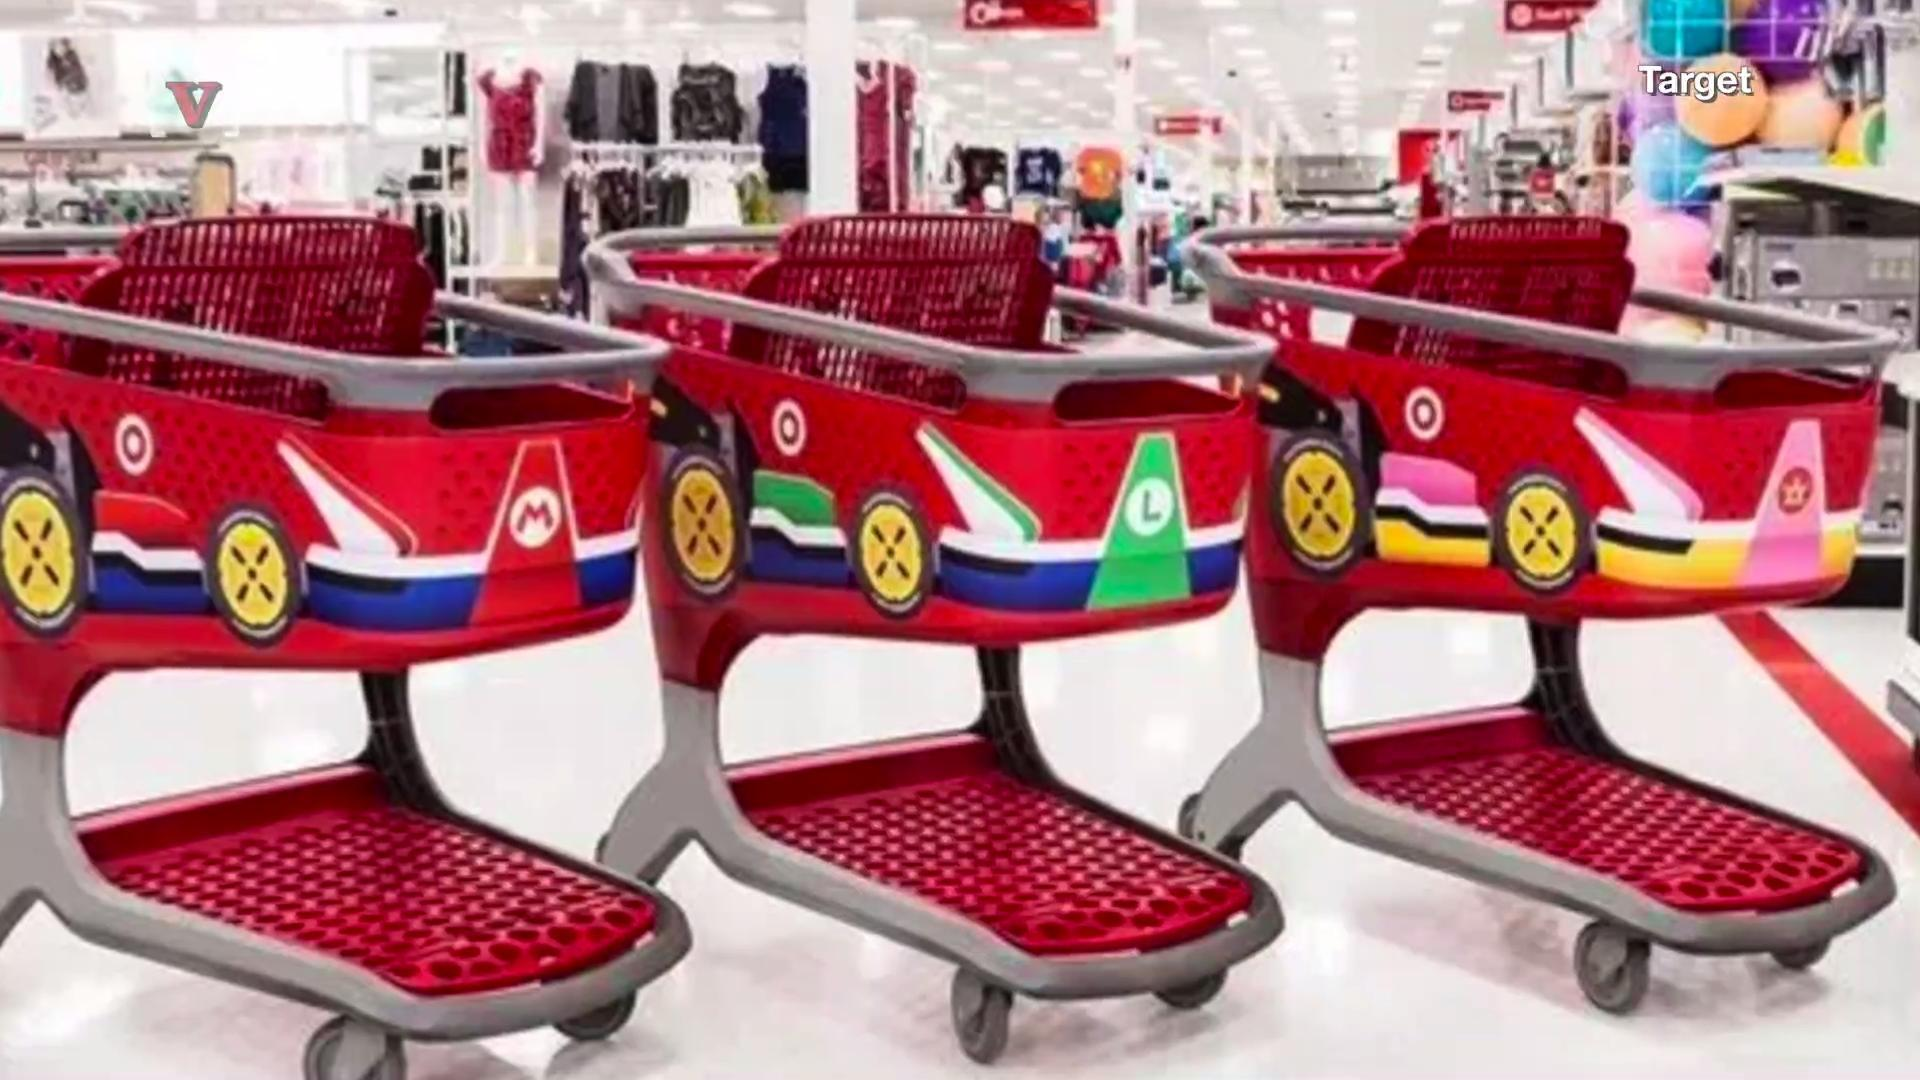 Target Now Has Mario Kart Shopping Carts